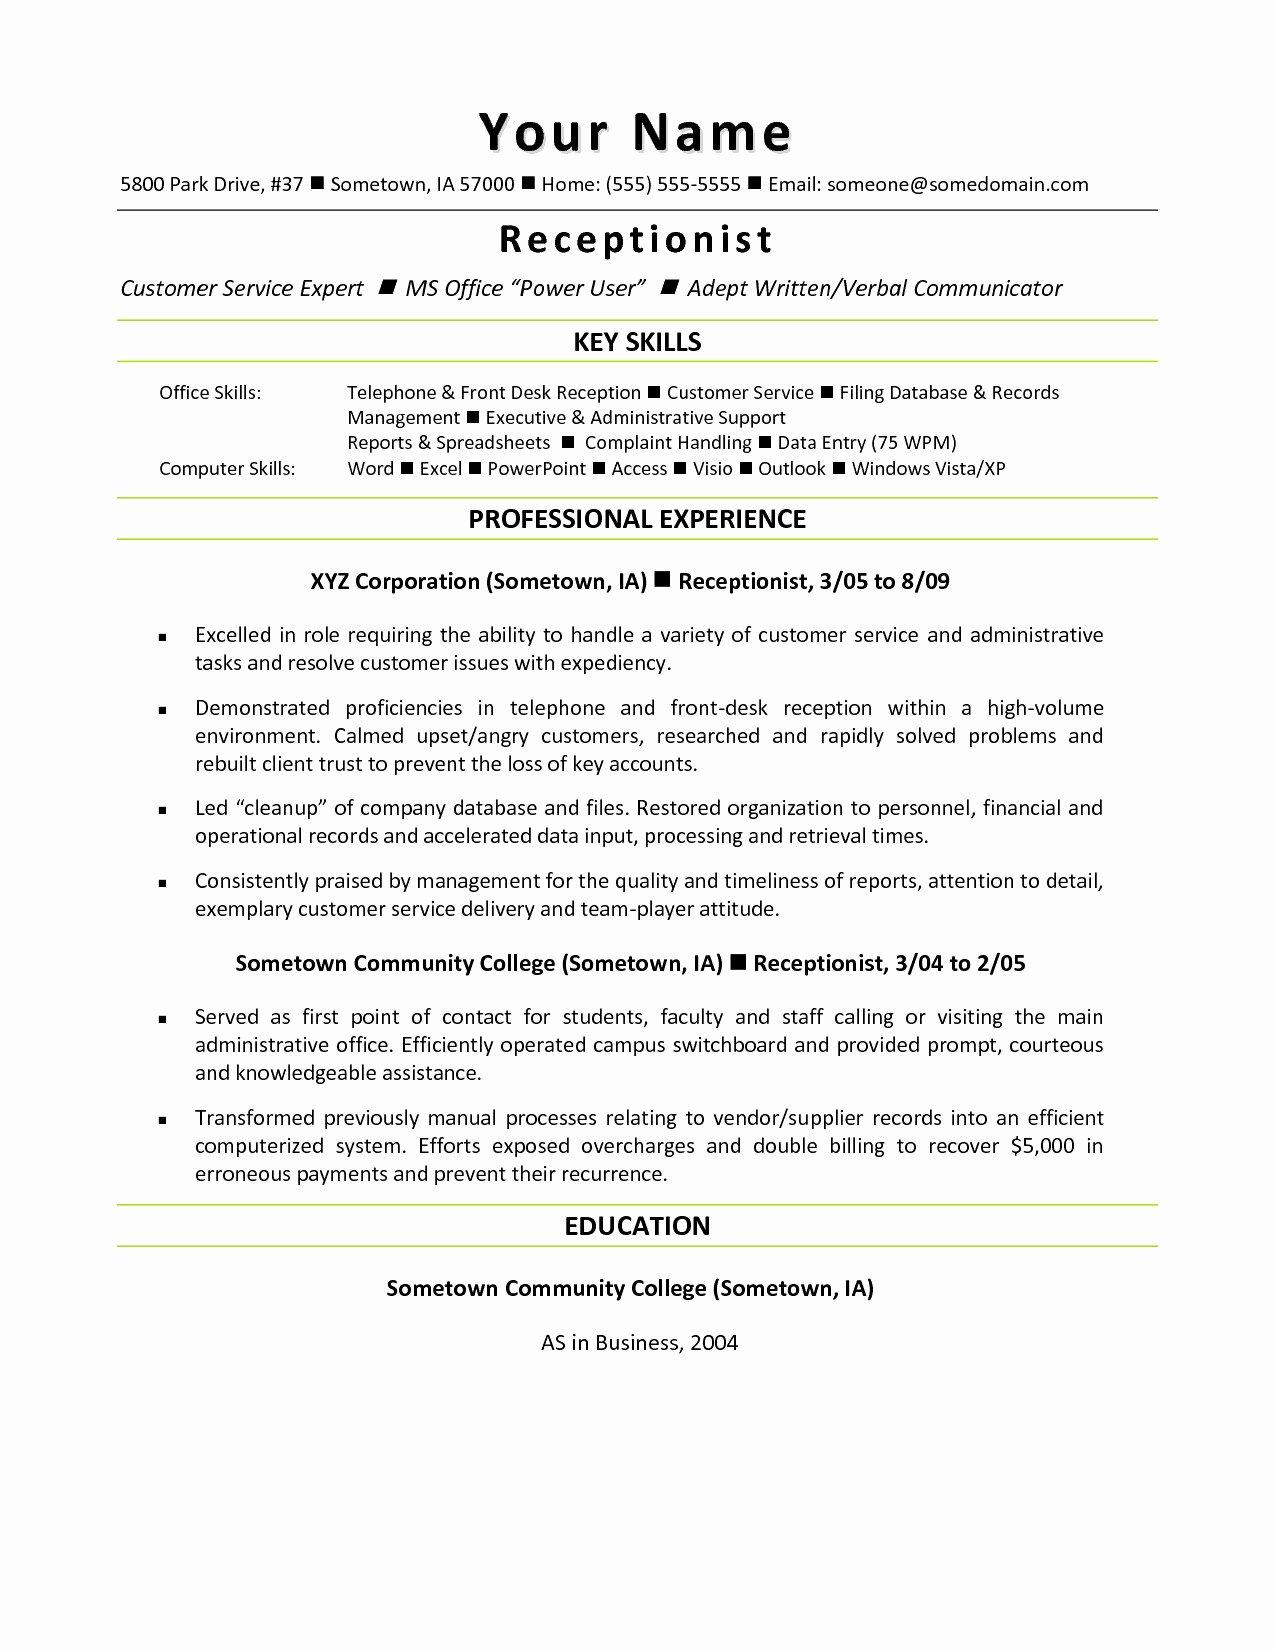 Contract Rescission Letter New Rescission Letter Template Sample